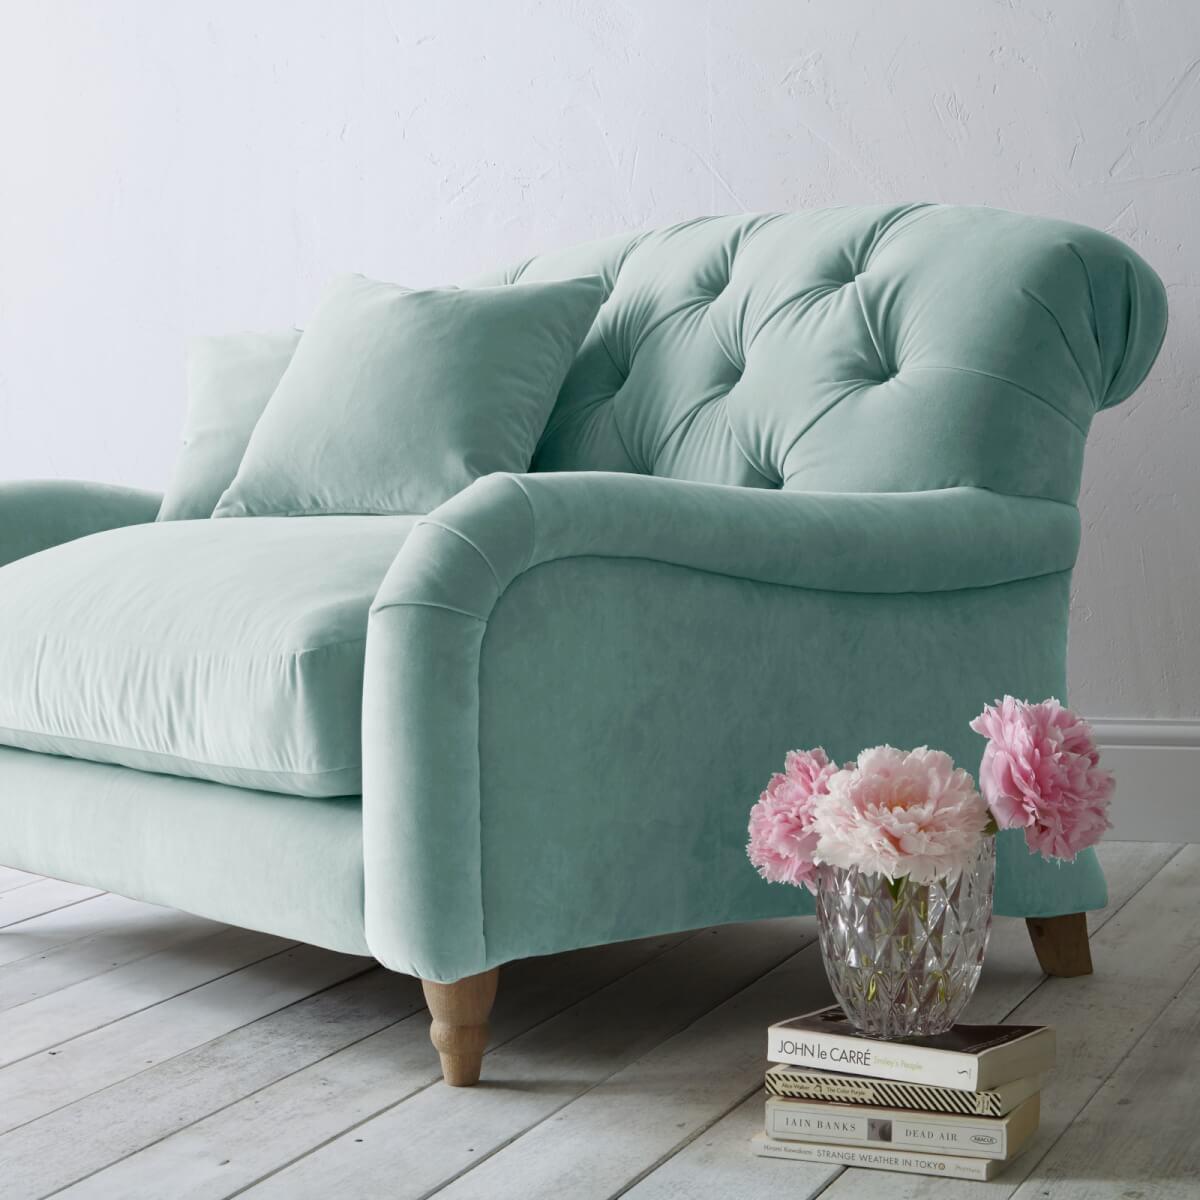 Snuggler Style Sofa